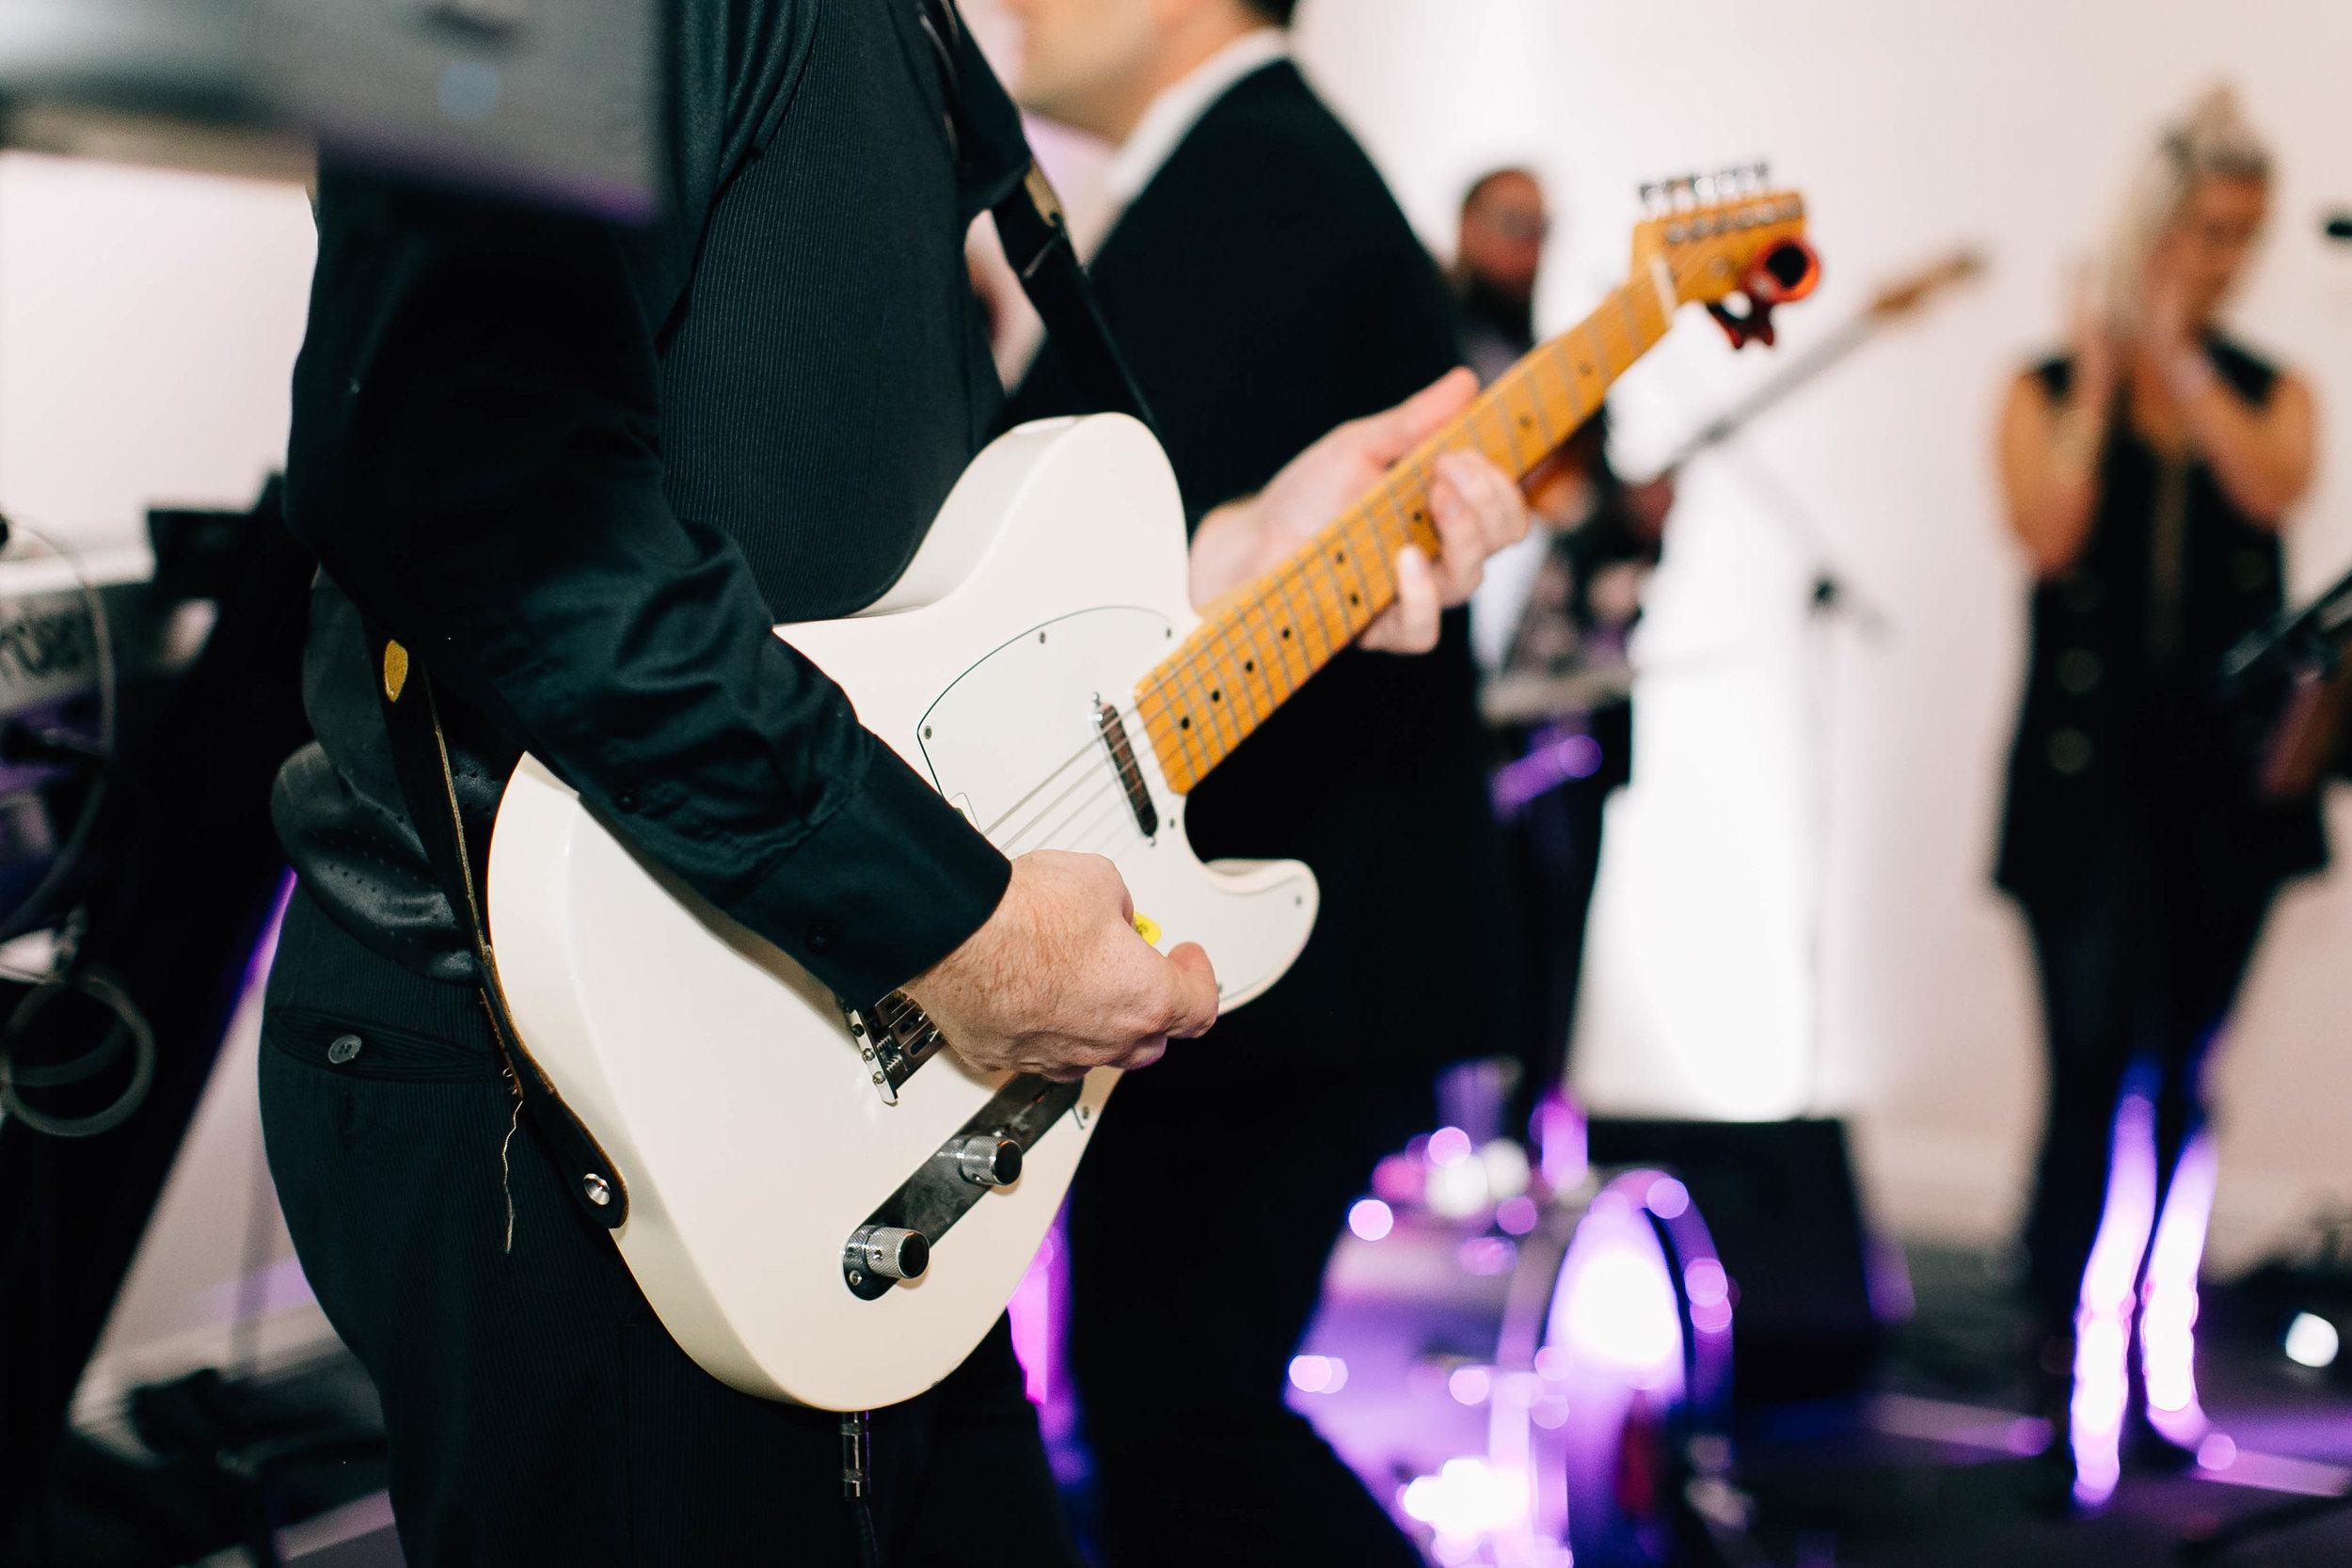 Bay Kings Band keeping everyone at the wedding on the dancefloor